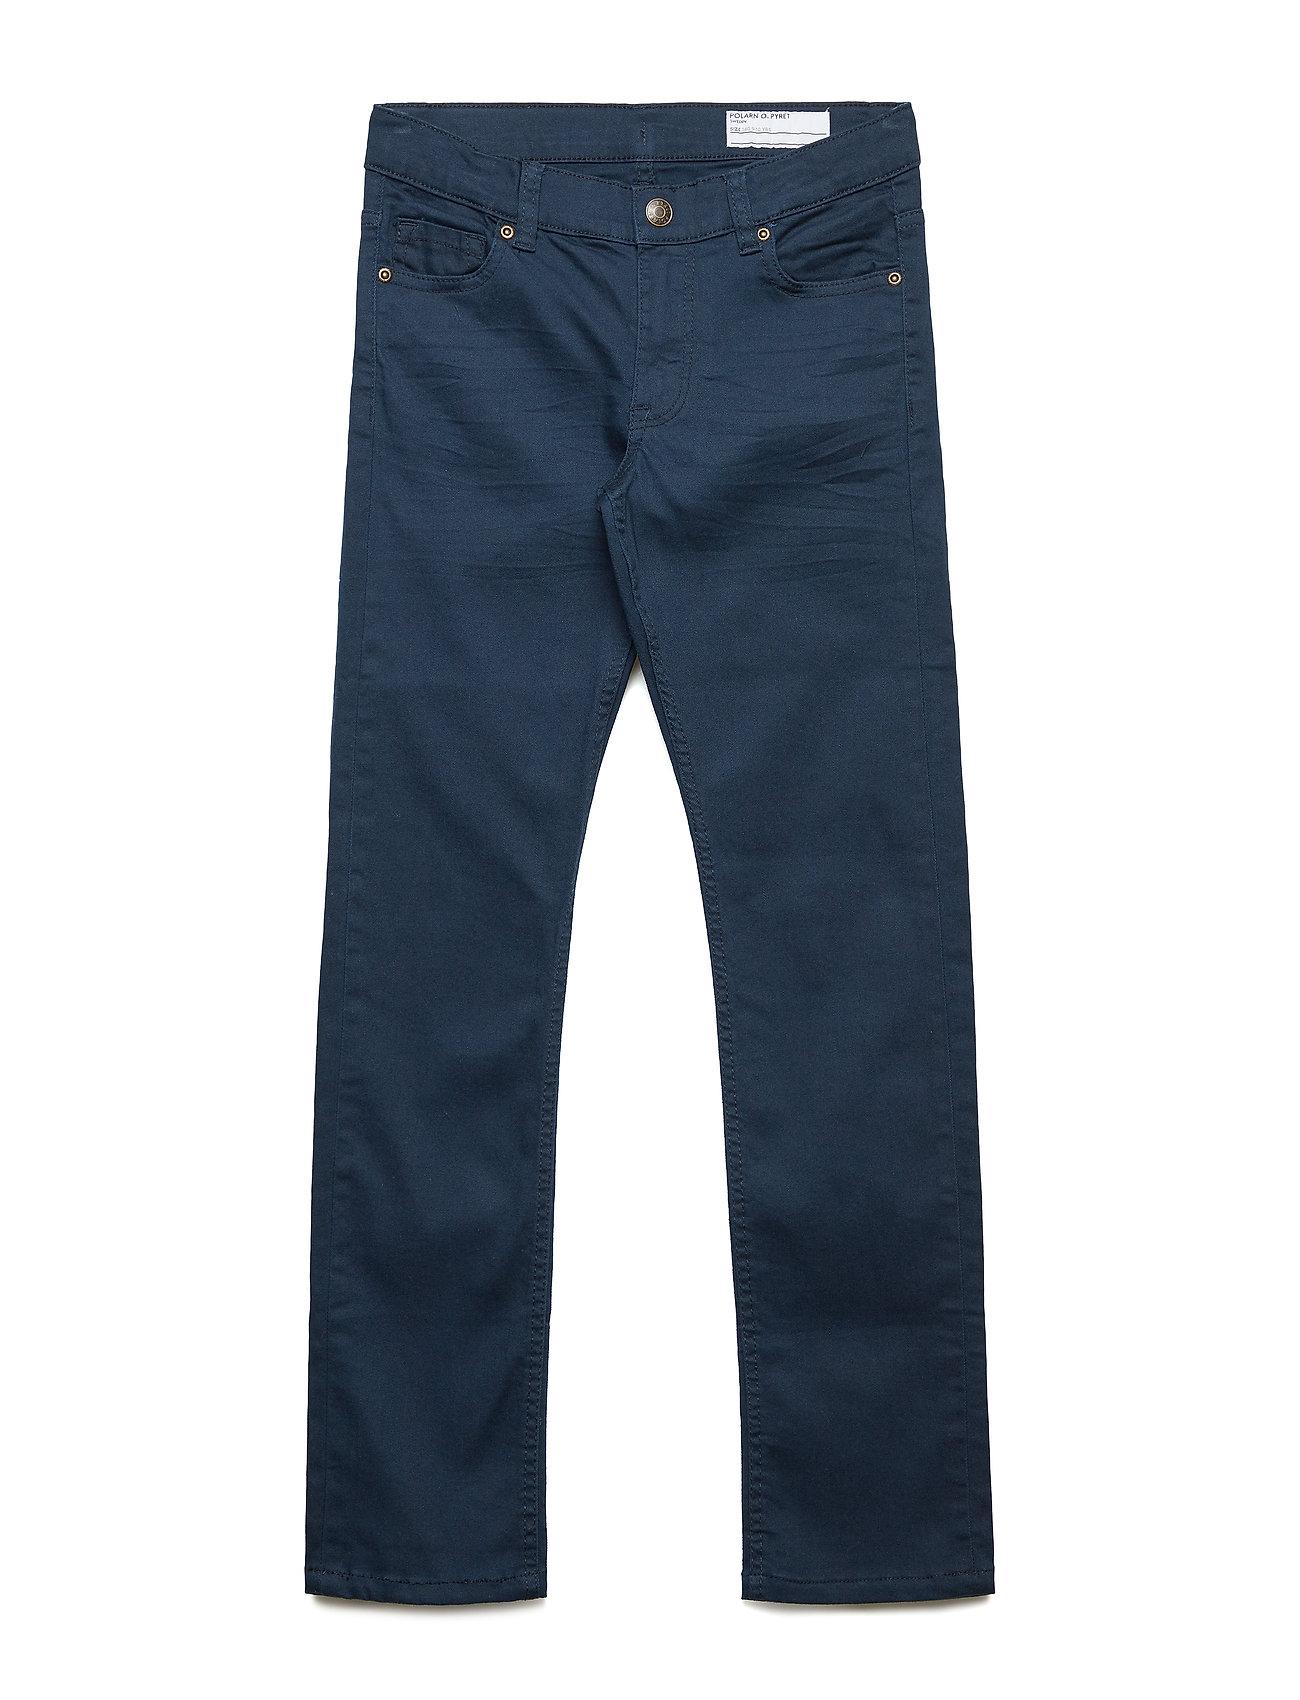 Polarn O. Pyret Slimfit Jeans